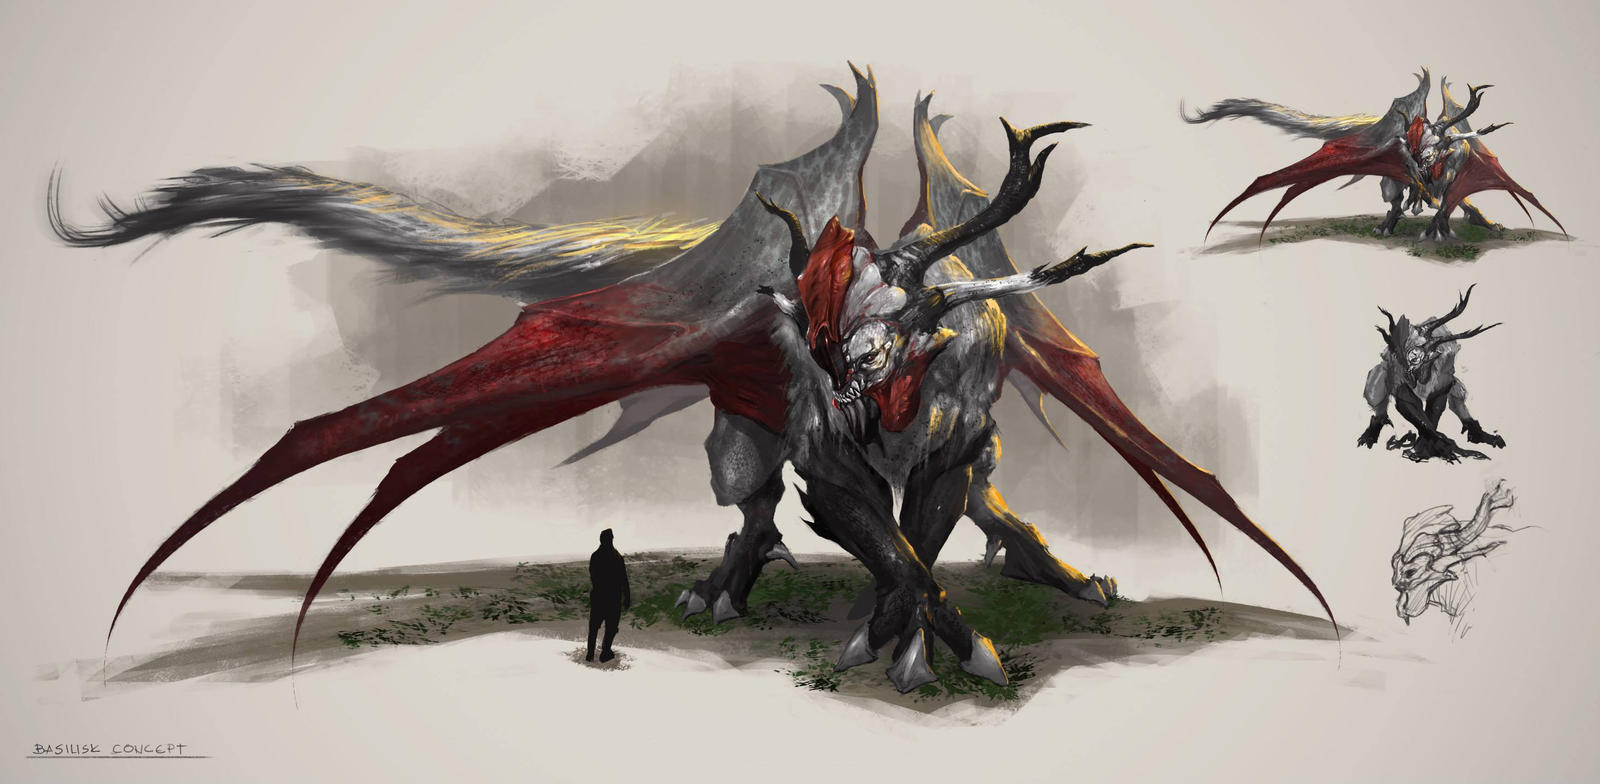 Basilisk, creature concept